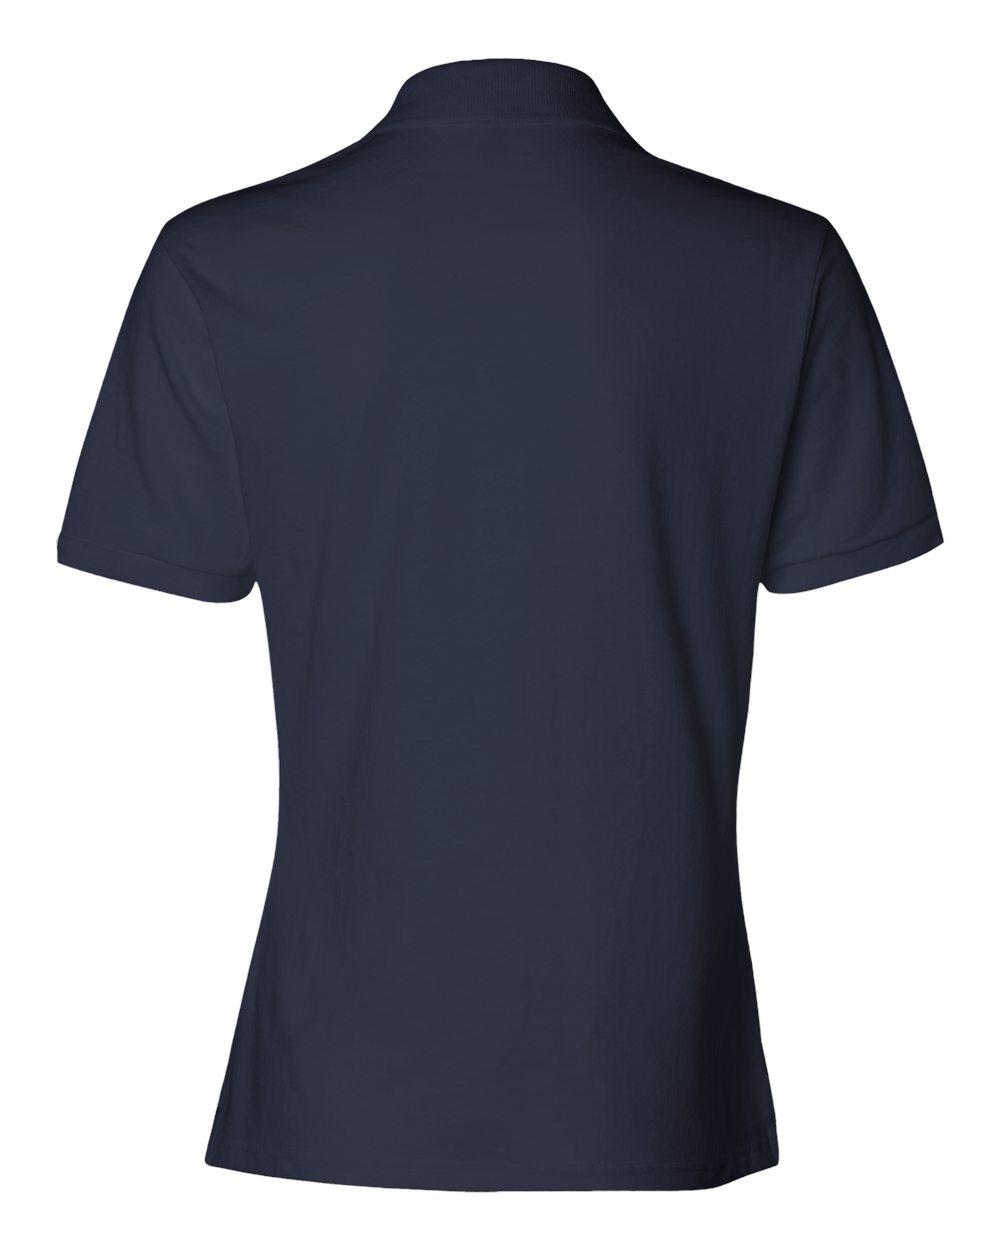 Jerzees-Womens-5-6-oz-50-50-Jersey-Polo-with-Spot-Shield-437W-Size-S-2XL thumbnail 33